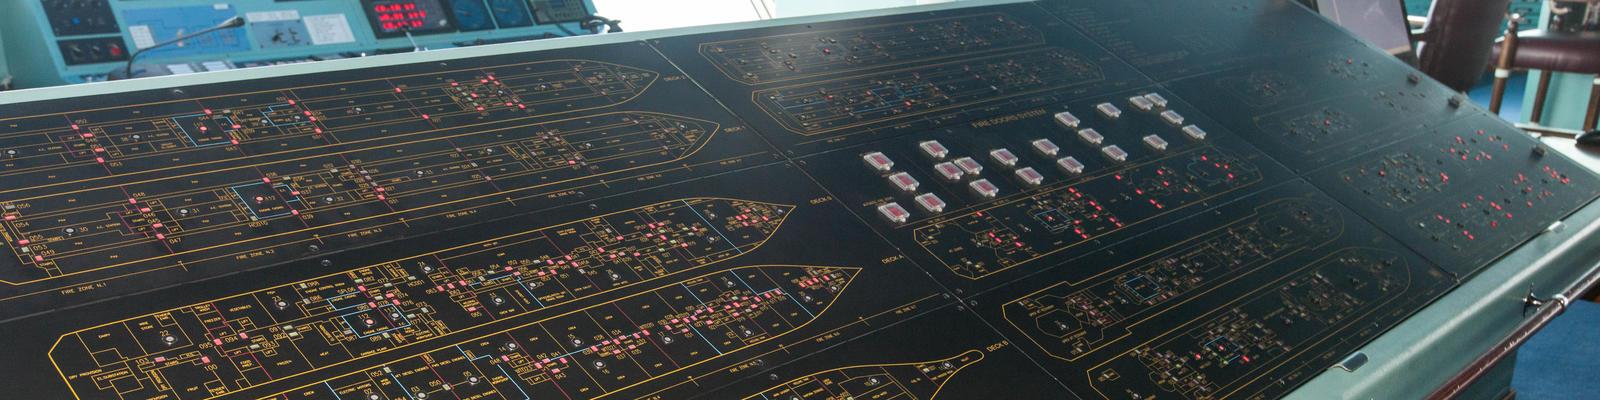 Cruise ship control room (Photo: Cruise Critic)